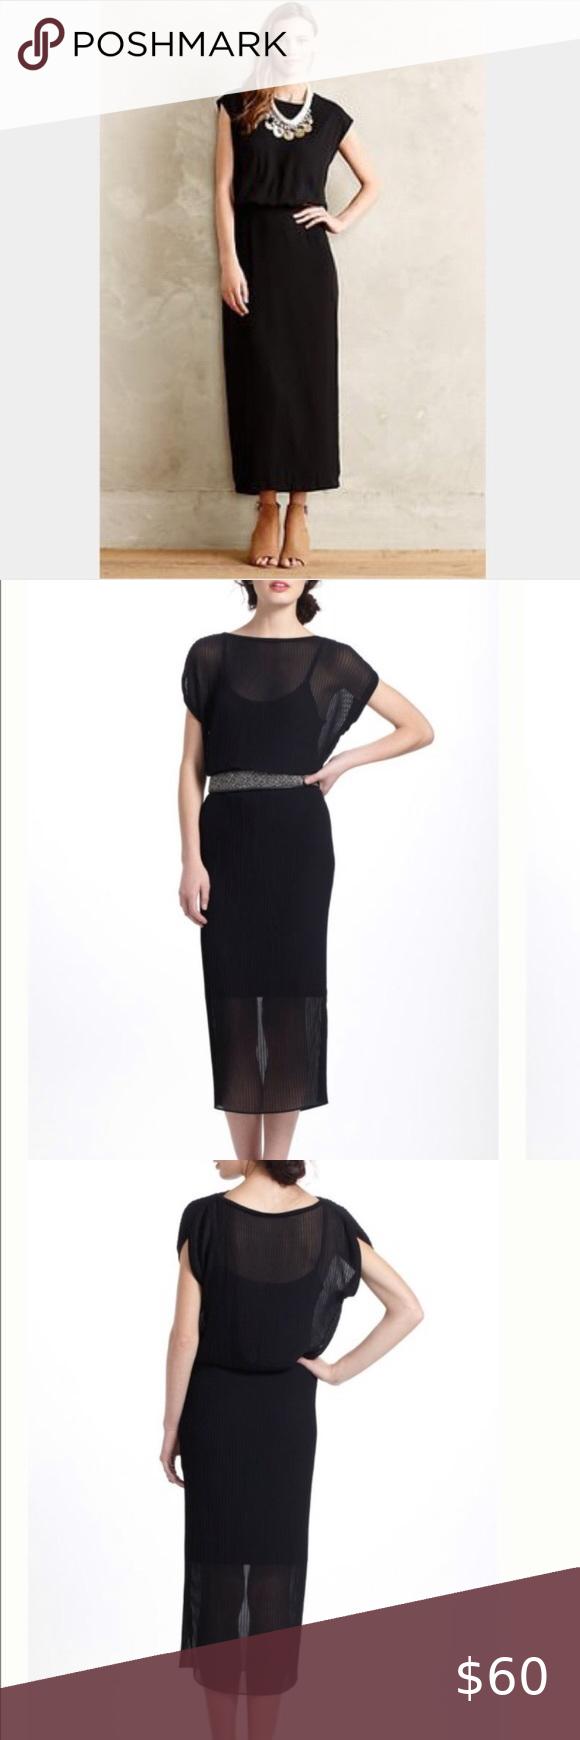 Anthropologie Bordeaux Accordion Pleat Midi Dress Black Pleated Dress Pleated Midi Dress Midi Dress [ 1740 x 580 Pixel ]